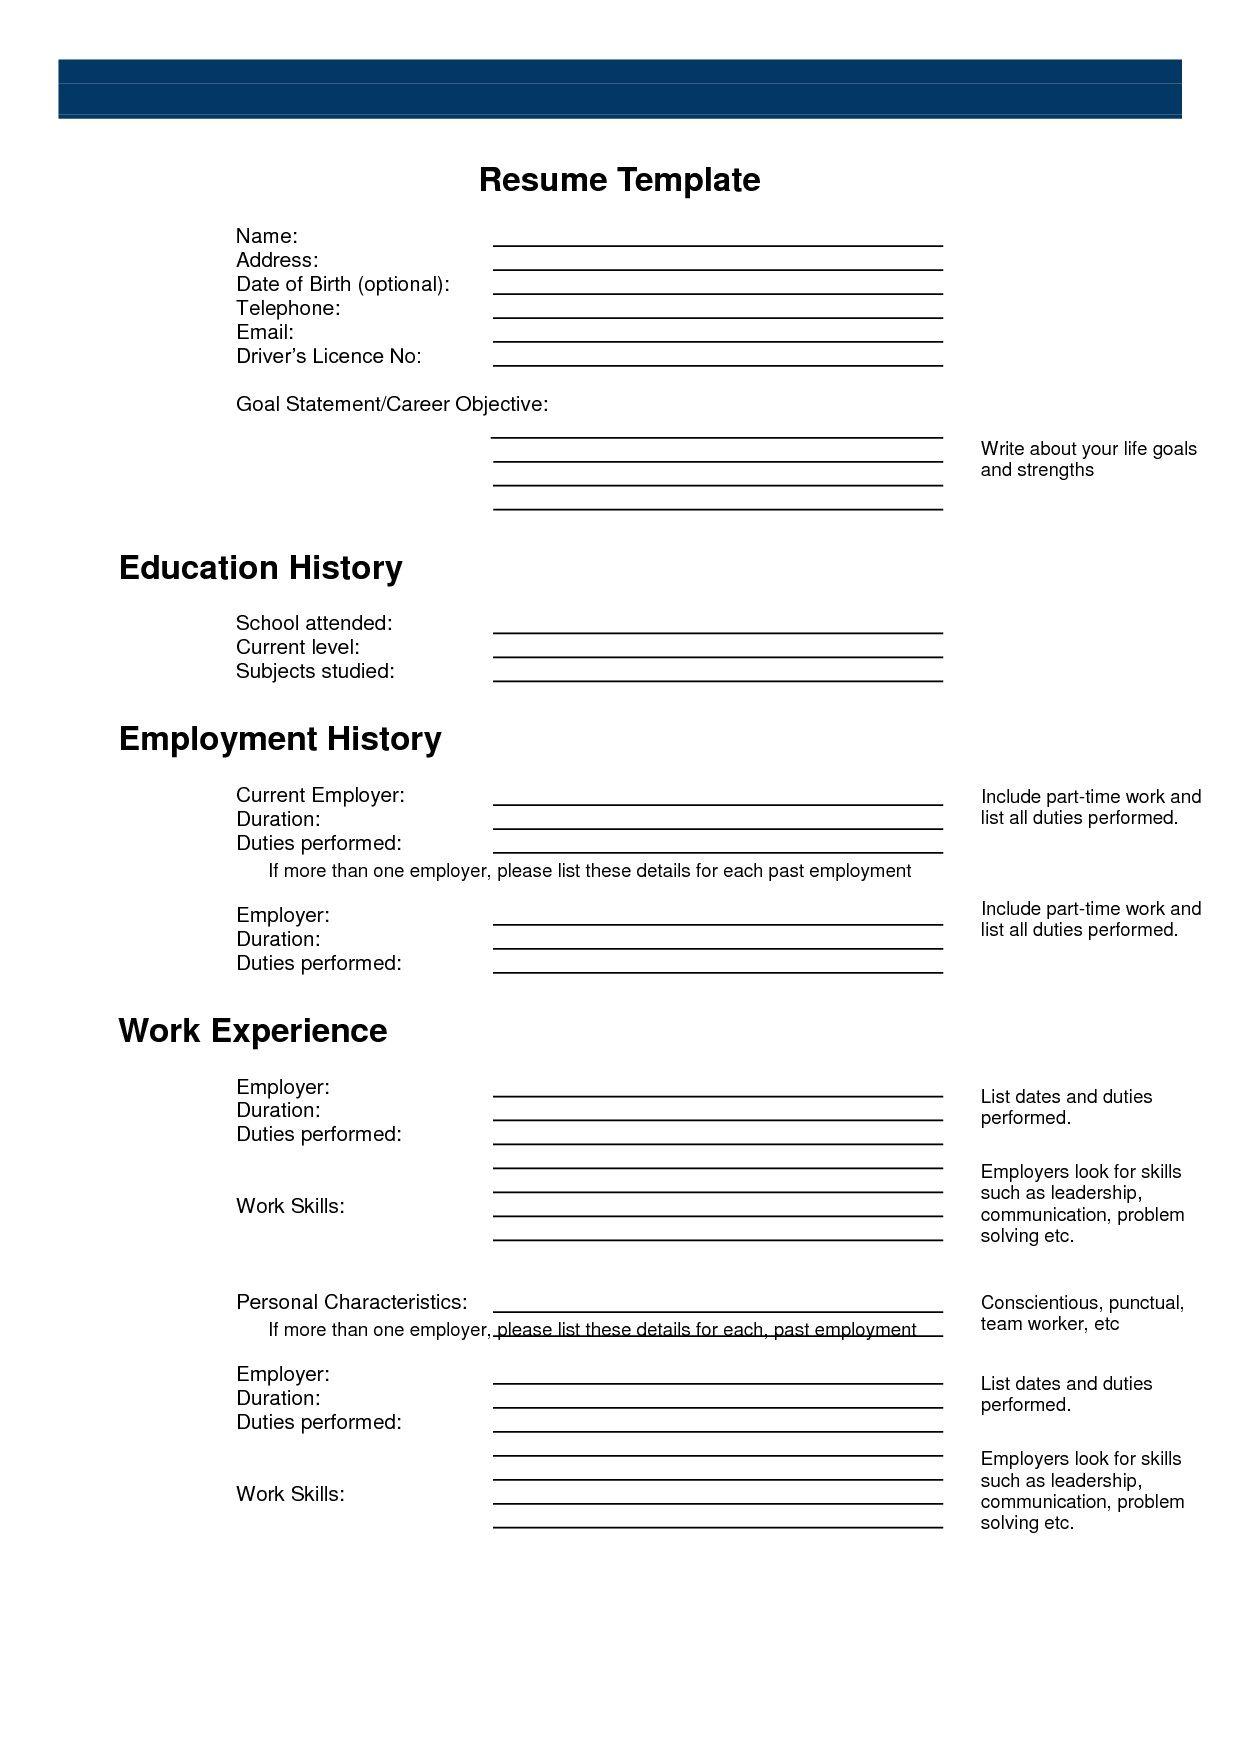 Free Printable Resume Builder